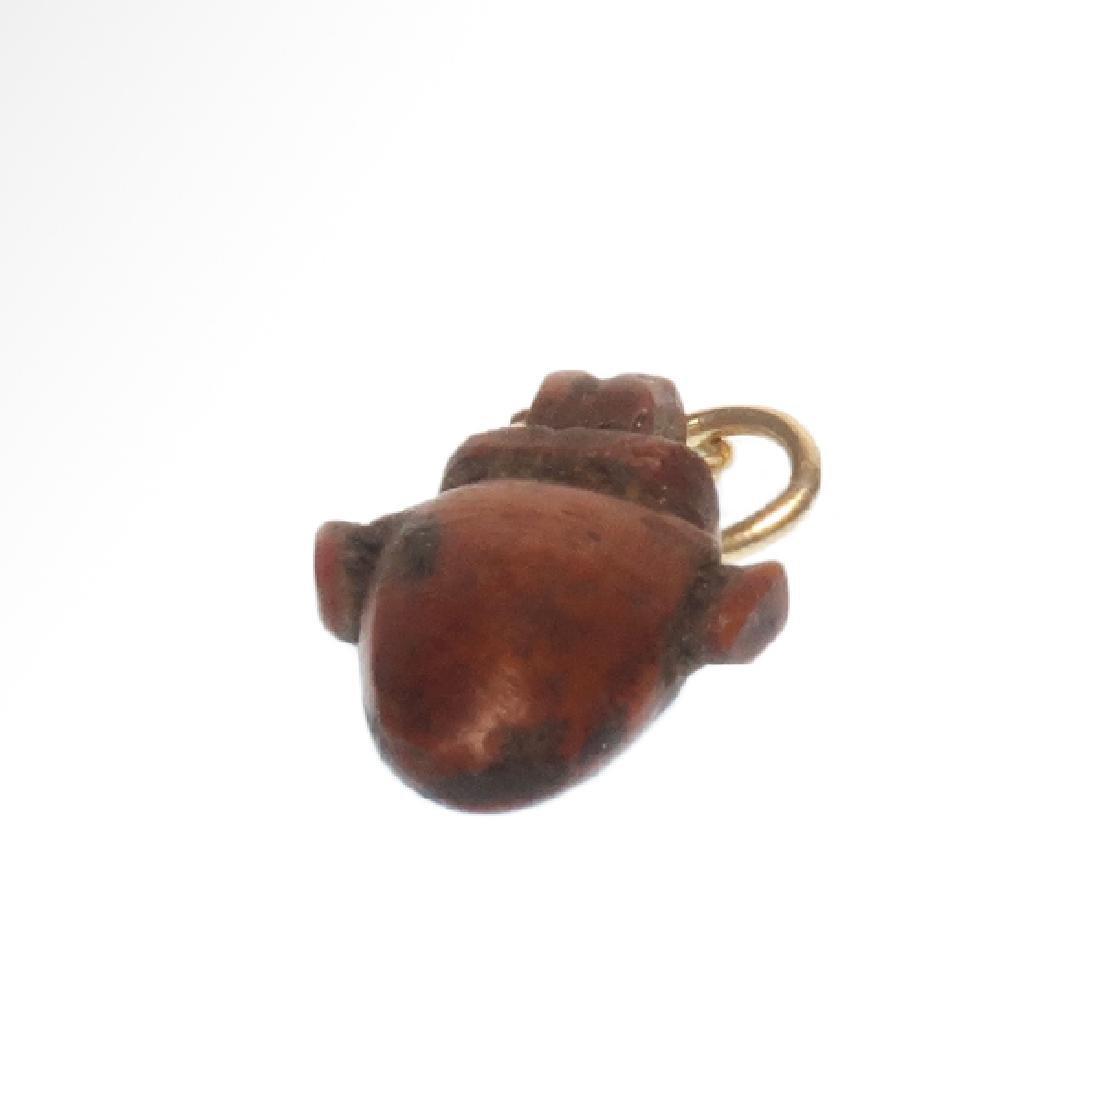 Egyptian Red Jasper Heart Amulet, New Kingdom, c. - 4